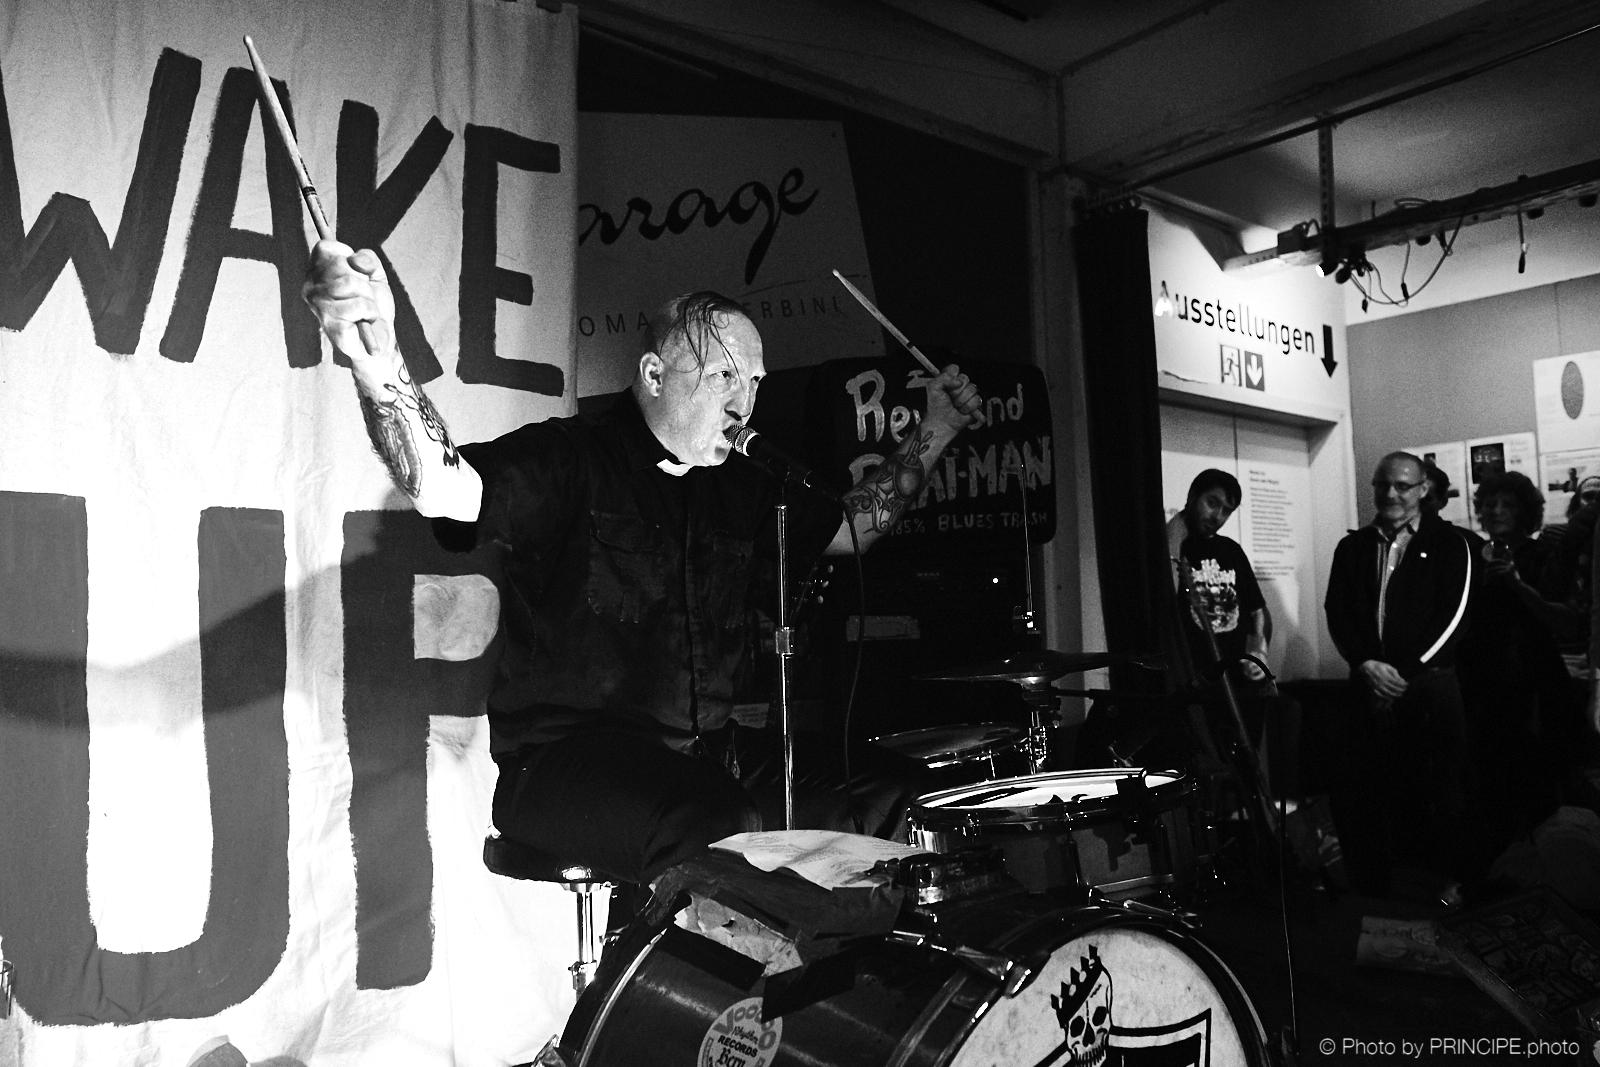 Reverend Beat-Man @ Photobastei